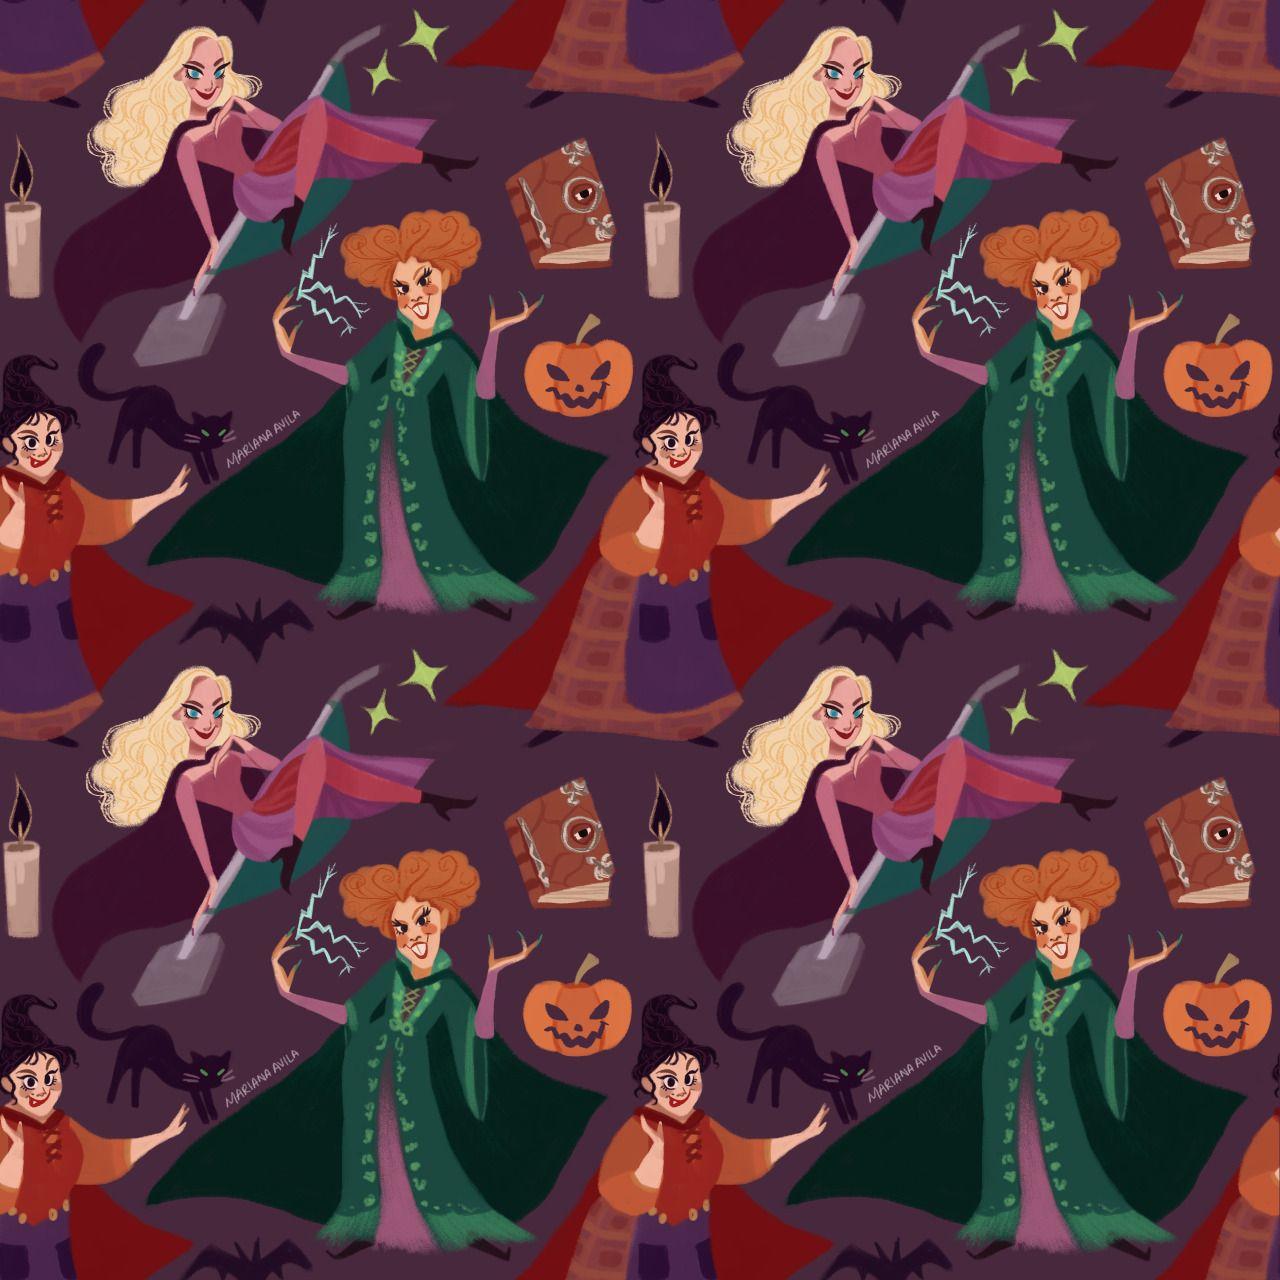 Hocus Pocus Tumblr Halloween Wallpaper Iphone Halloween Wallpaper Witch Wallpaper